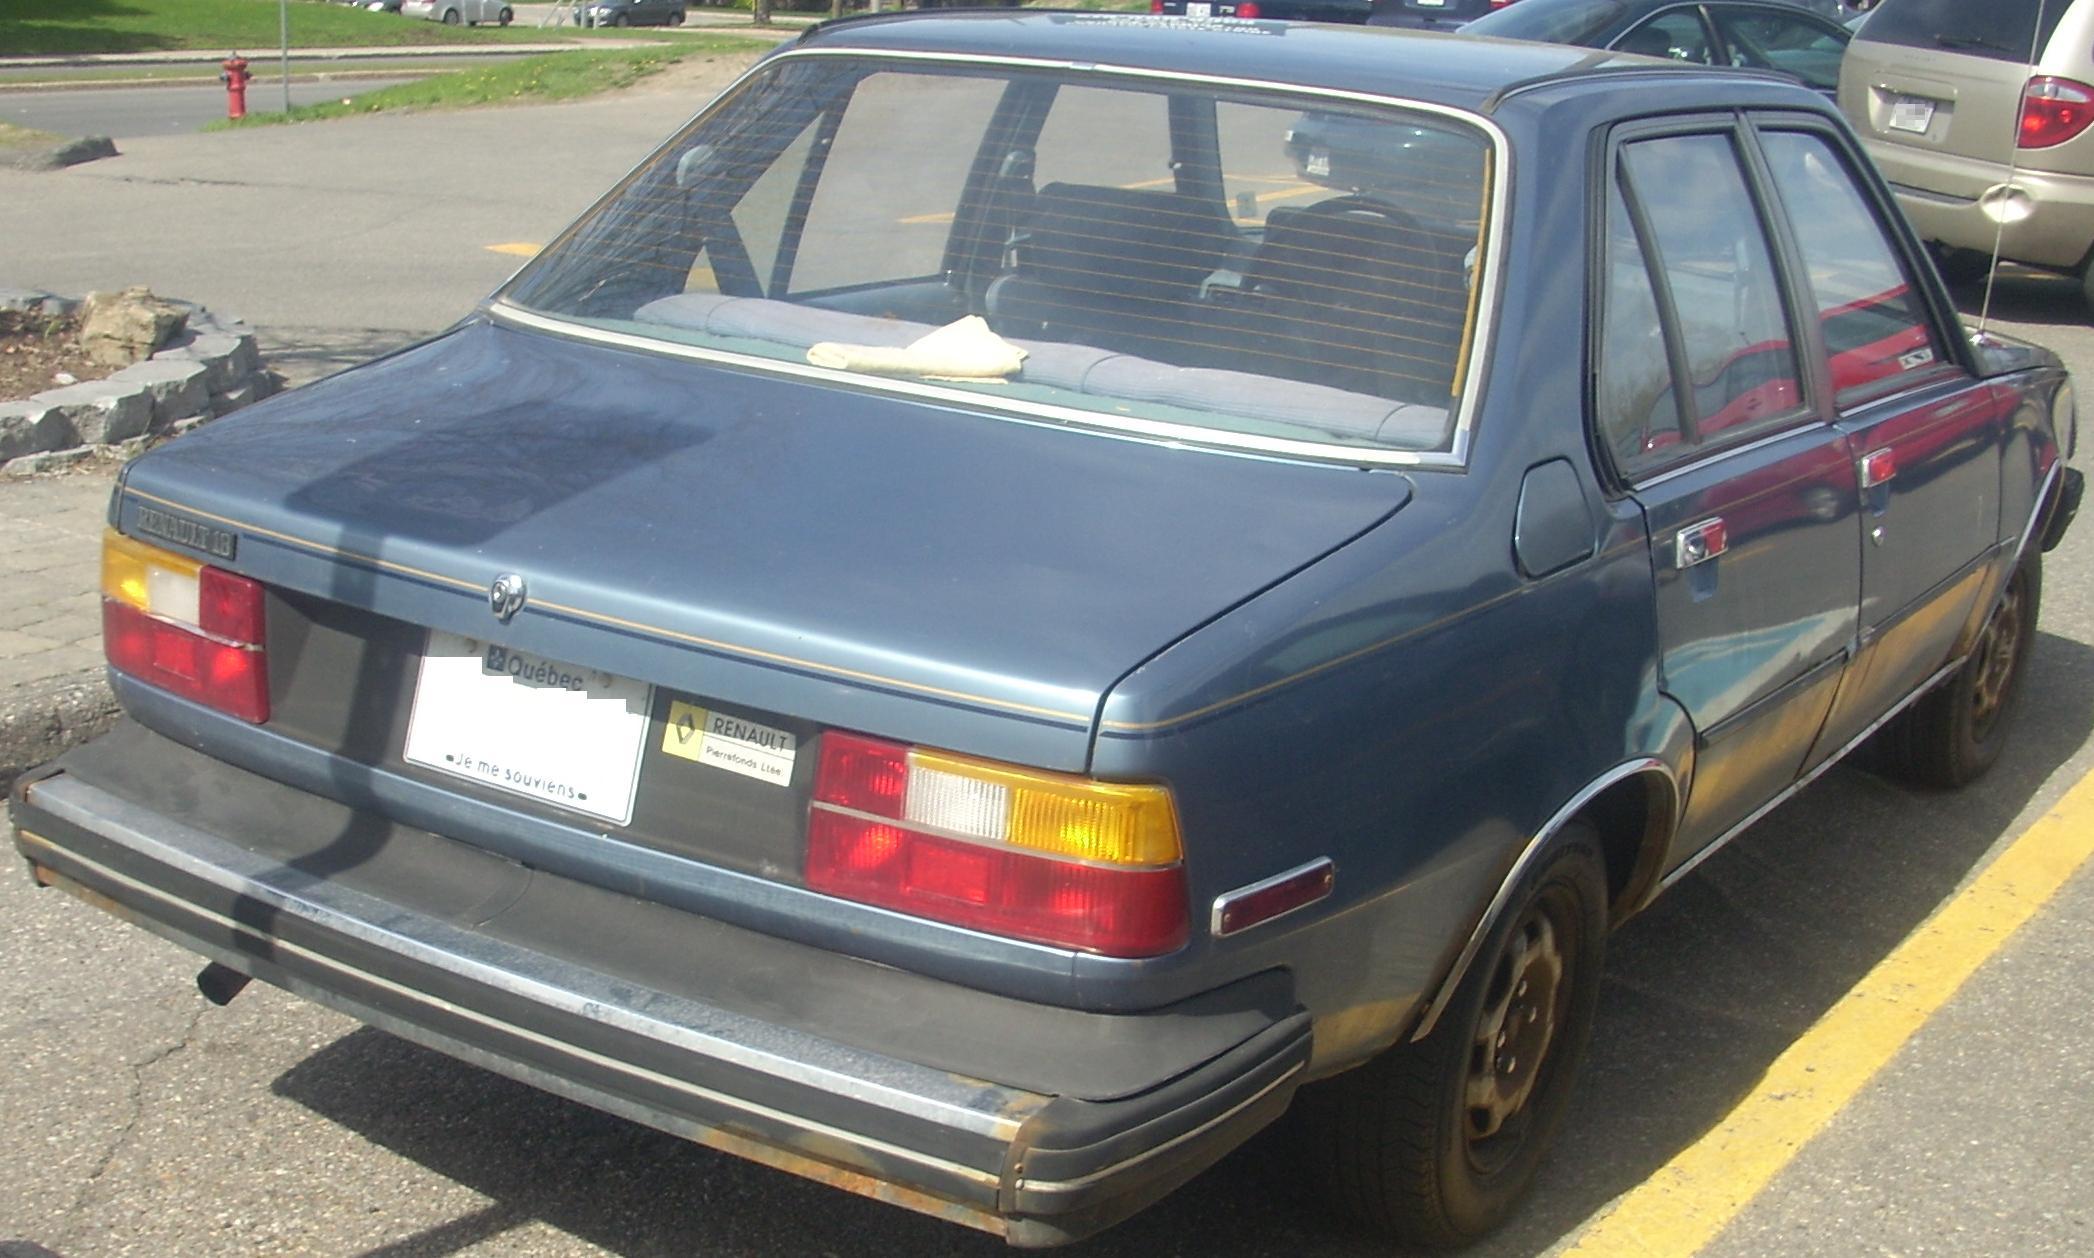 File:'81-'82 Renault 18 Sedan (Rear).jpg - Wikipedia